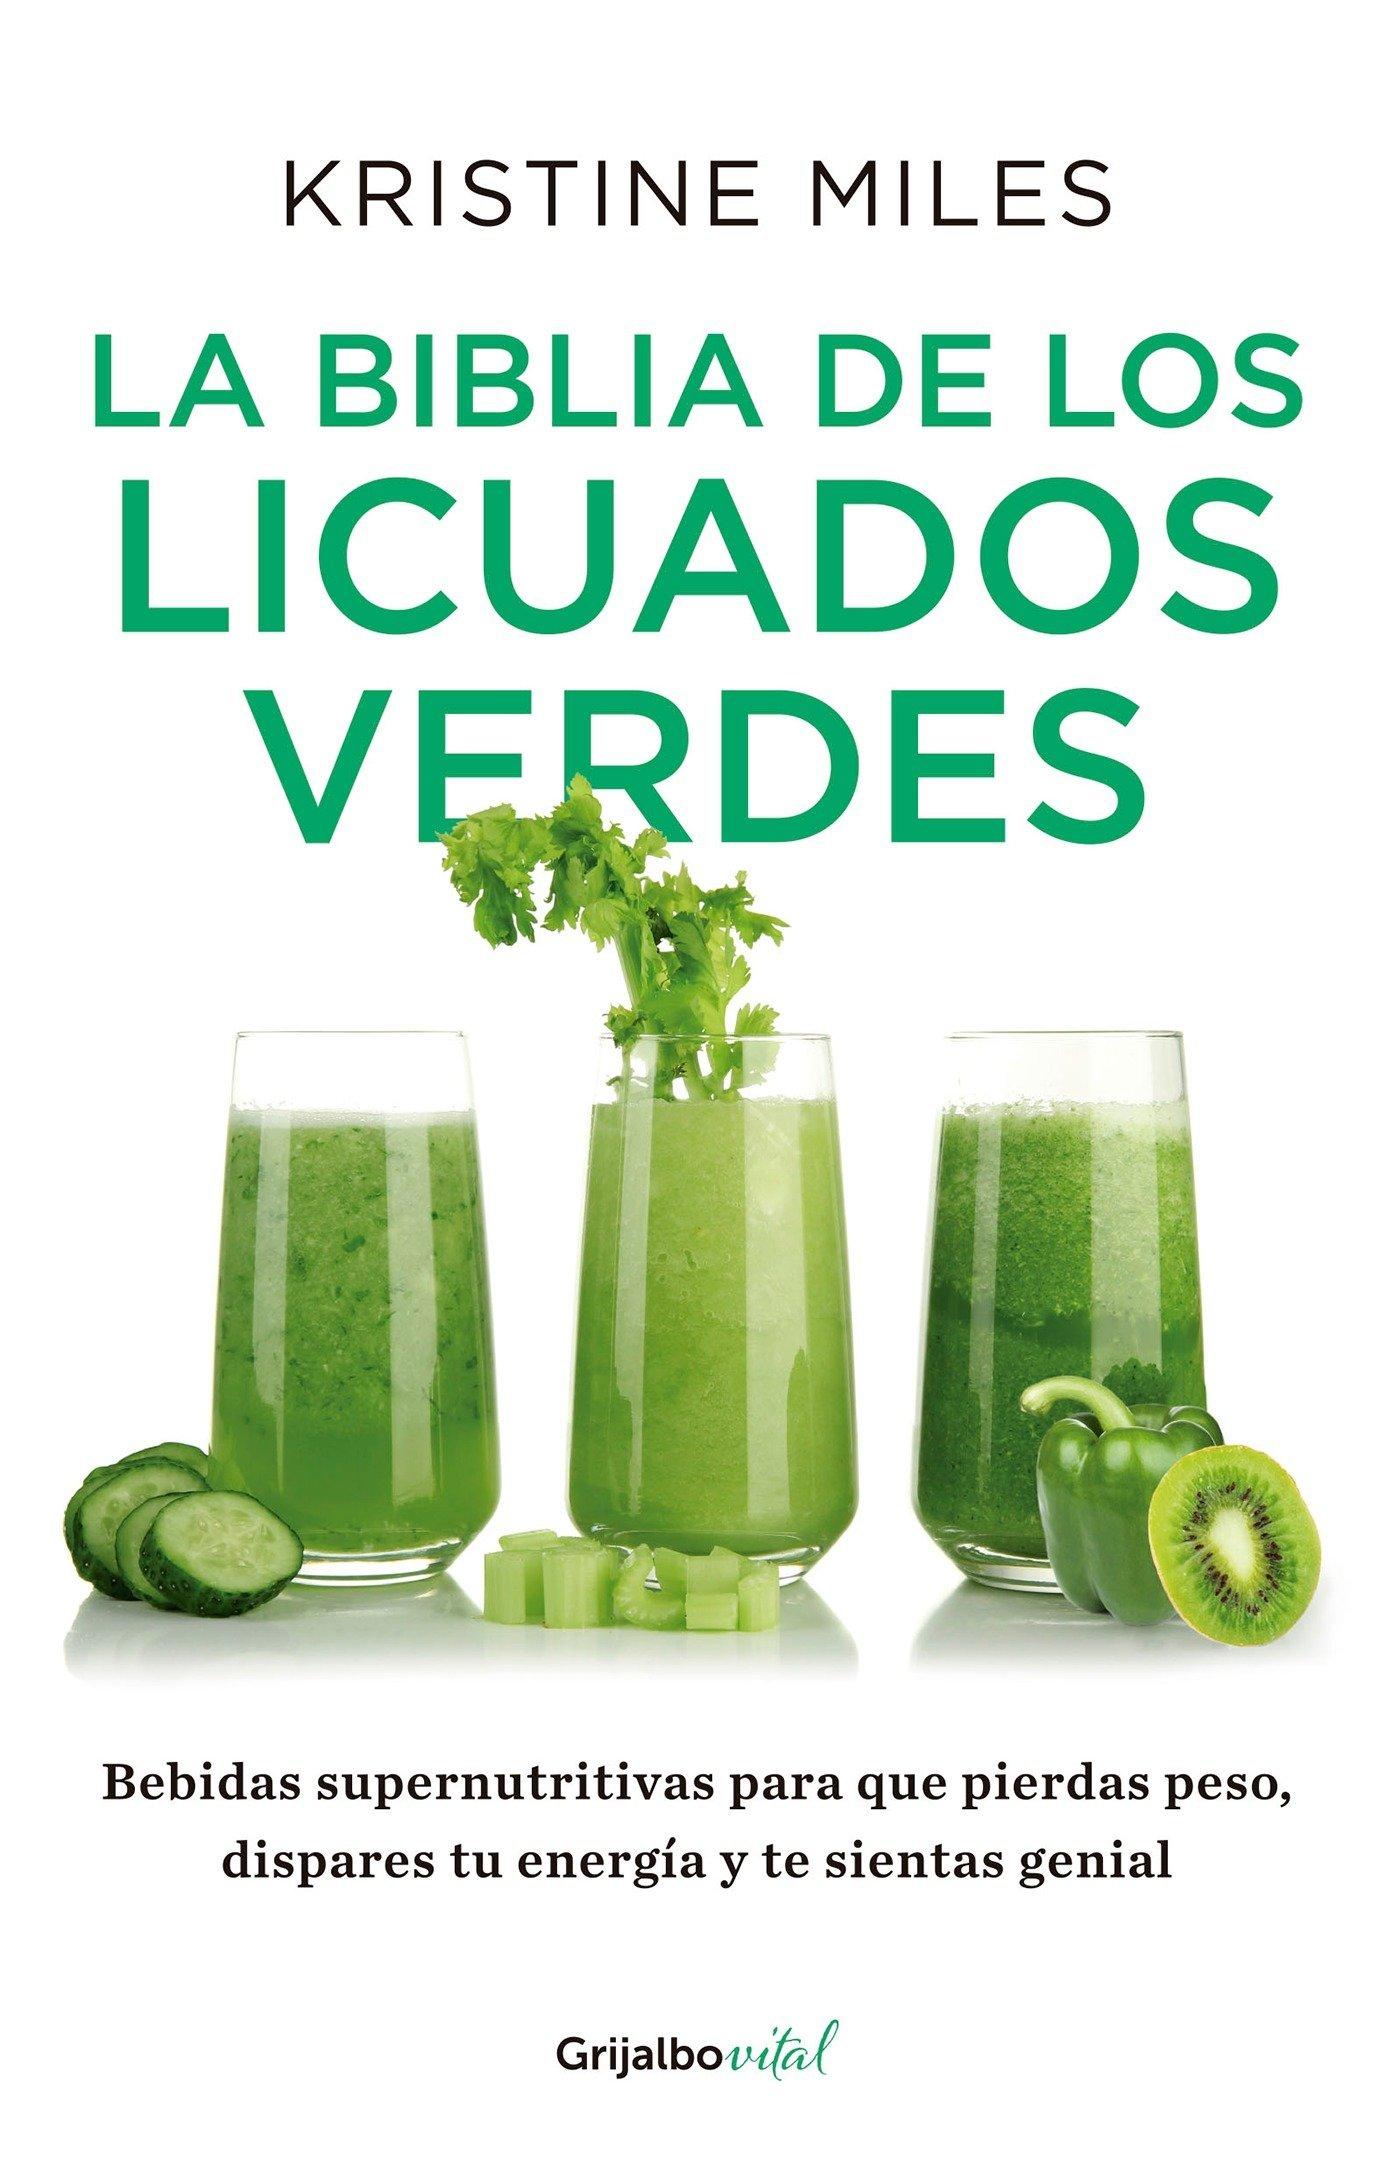 biblia licuados verdes Green Smoothie product image